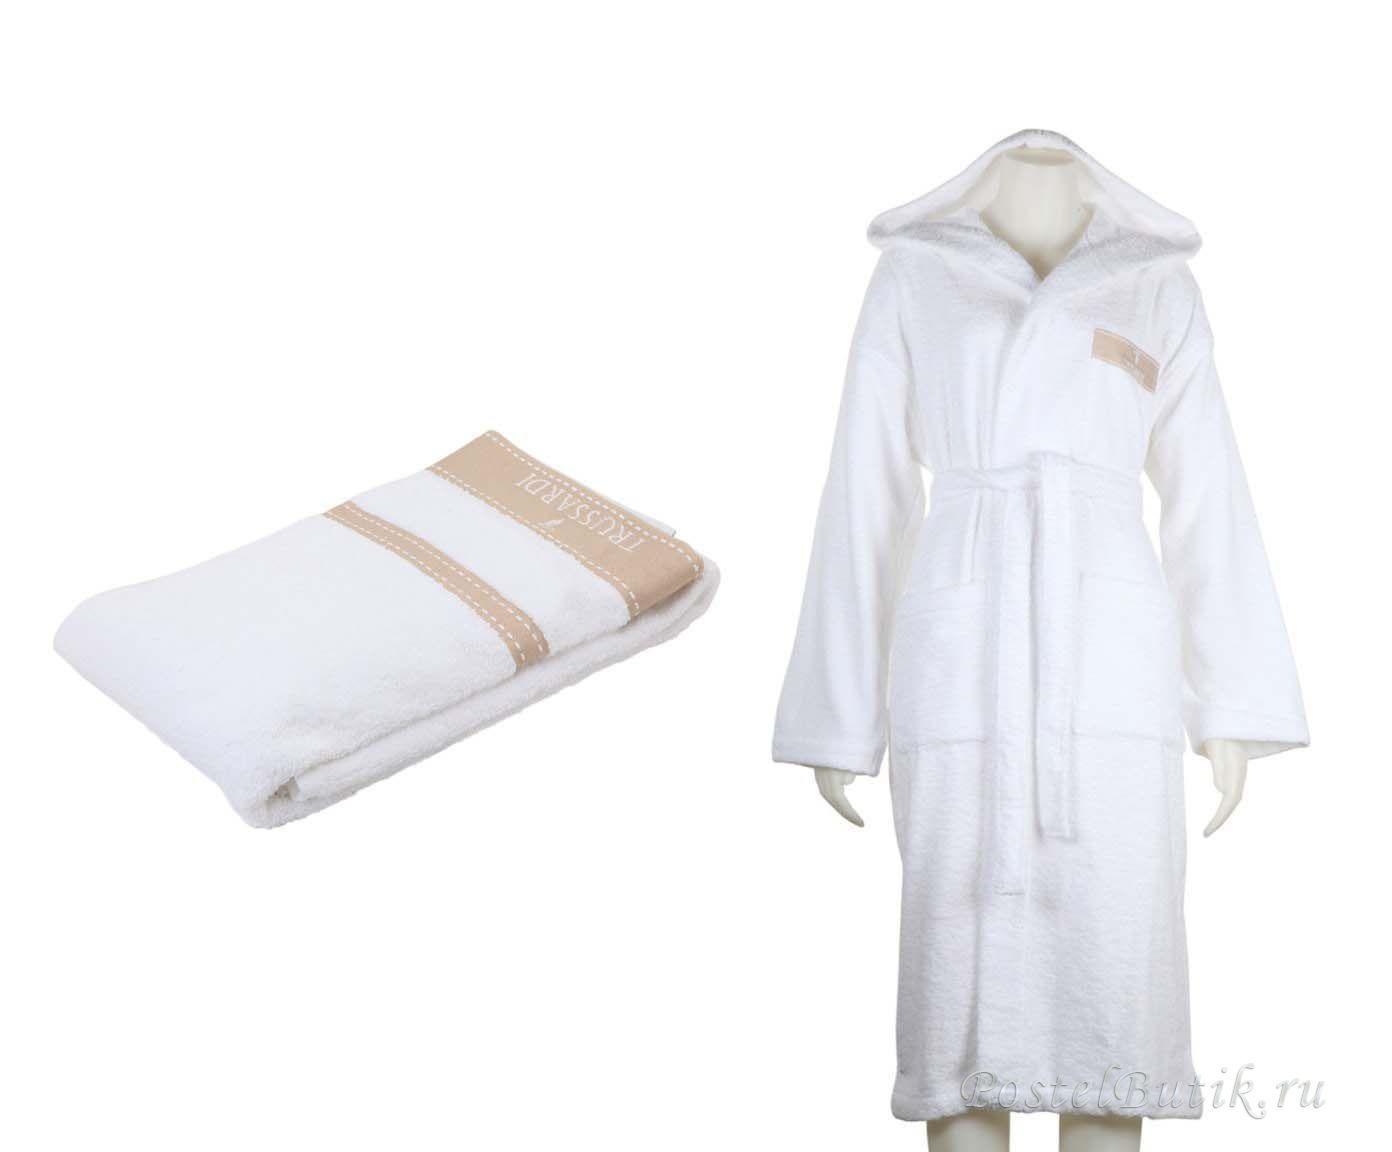 Наборы полотенец Набор полотенец 3 шт Trussardi Golf и халаты XL белый mahrovy-halat-i-polotentsa-logo-ot-trussardi.jpg